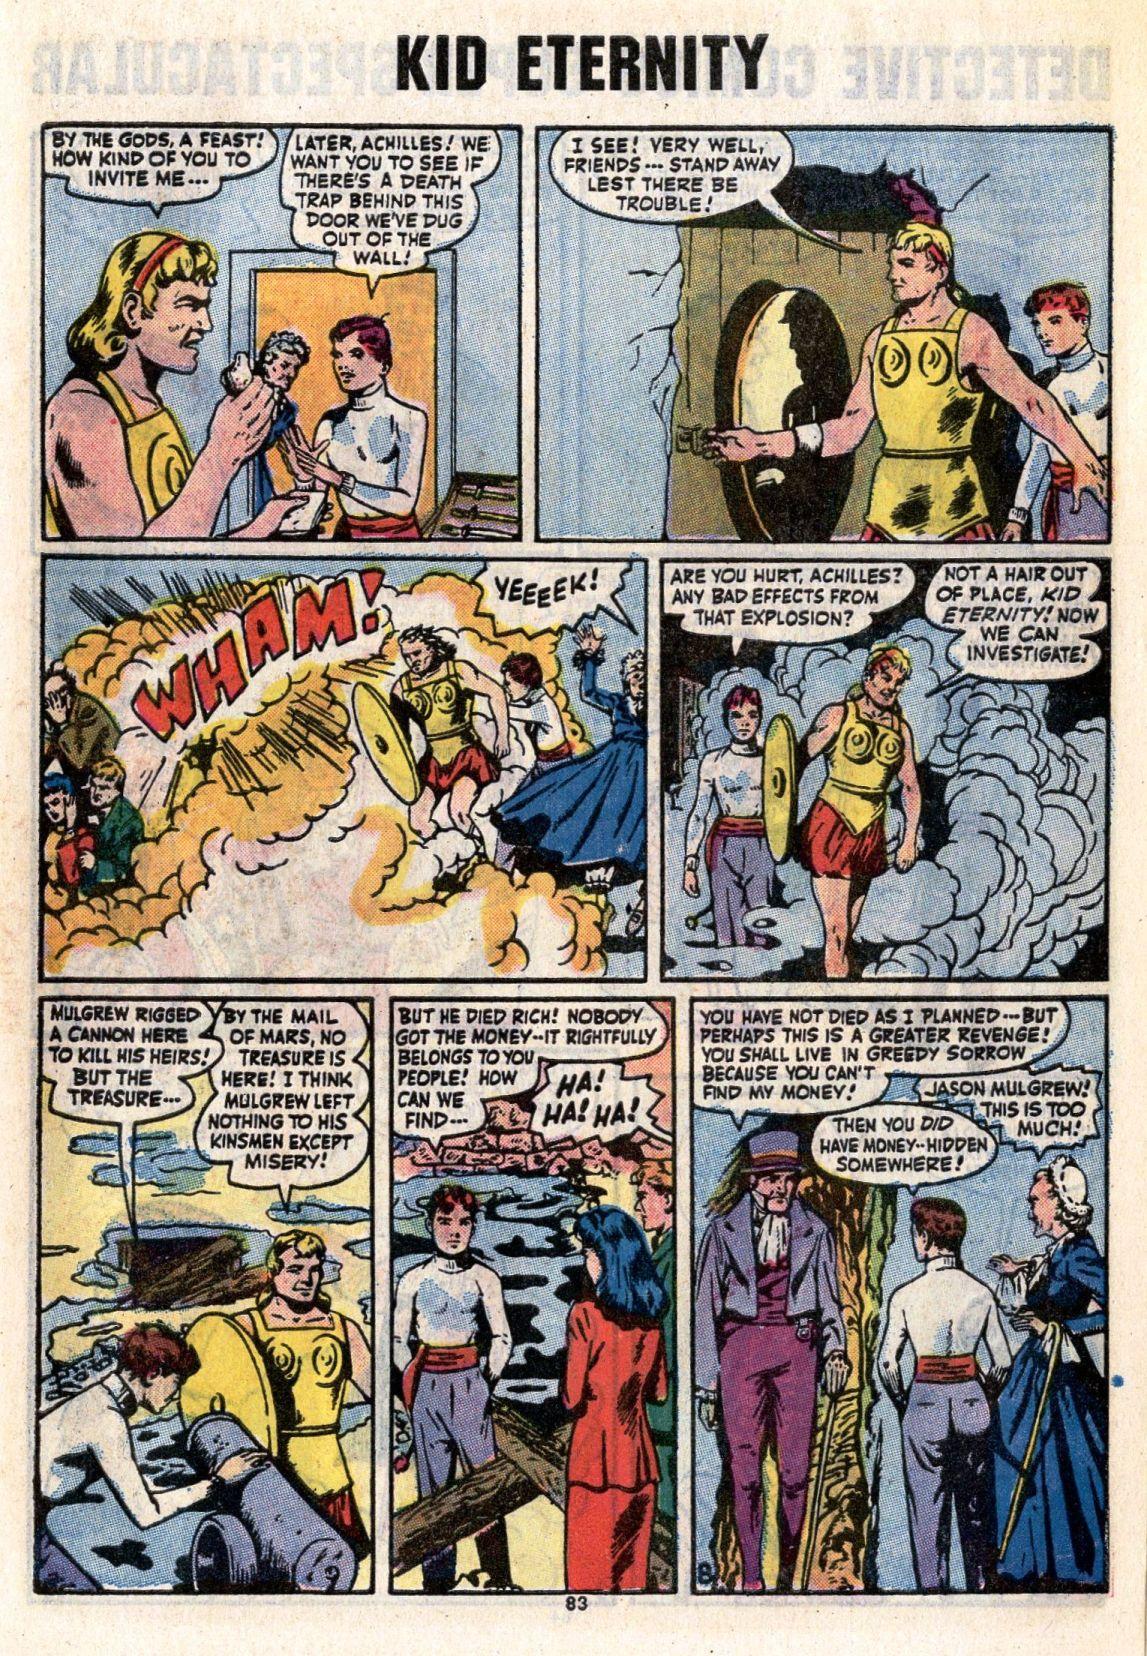 Detective Comics (1937) 439 Page 82